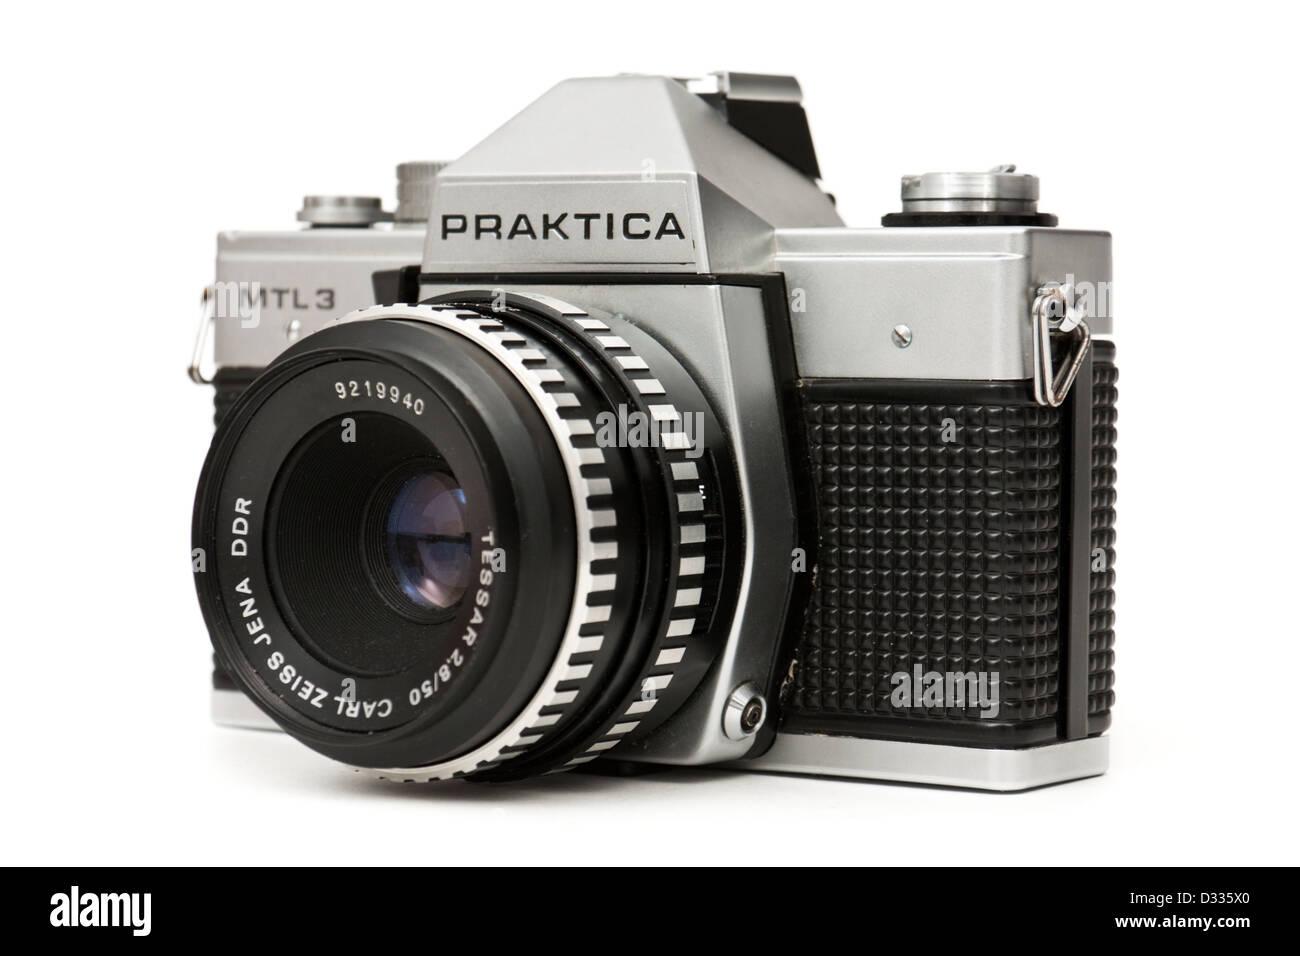 Ways to use a praktica mtl mm film camera wikihow